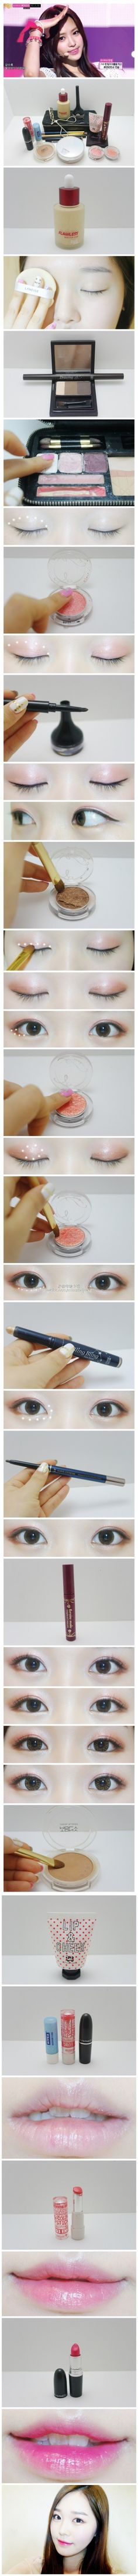 Korean make up   http://eyecandyscom.tumblr.com  www.AsianSkincare.Rocks